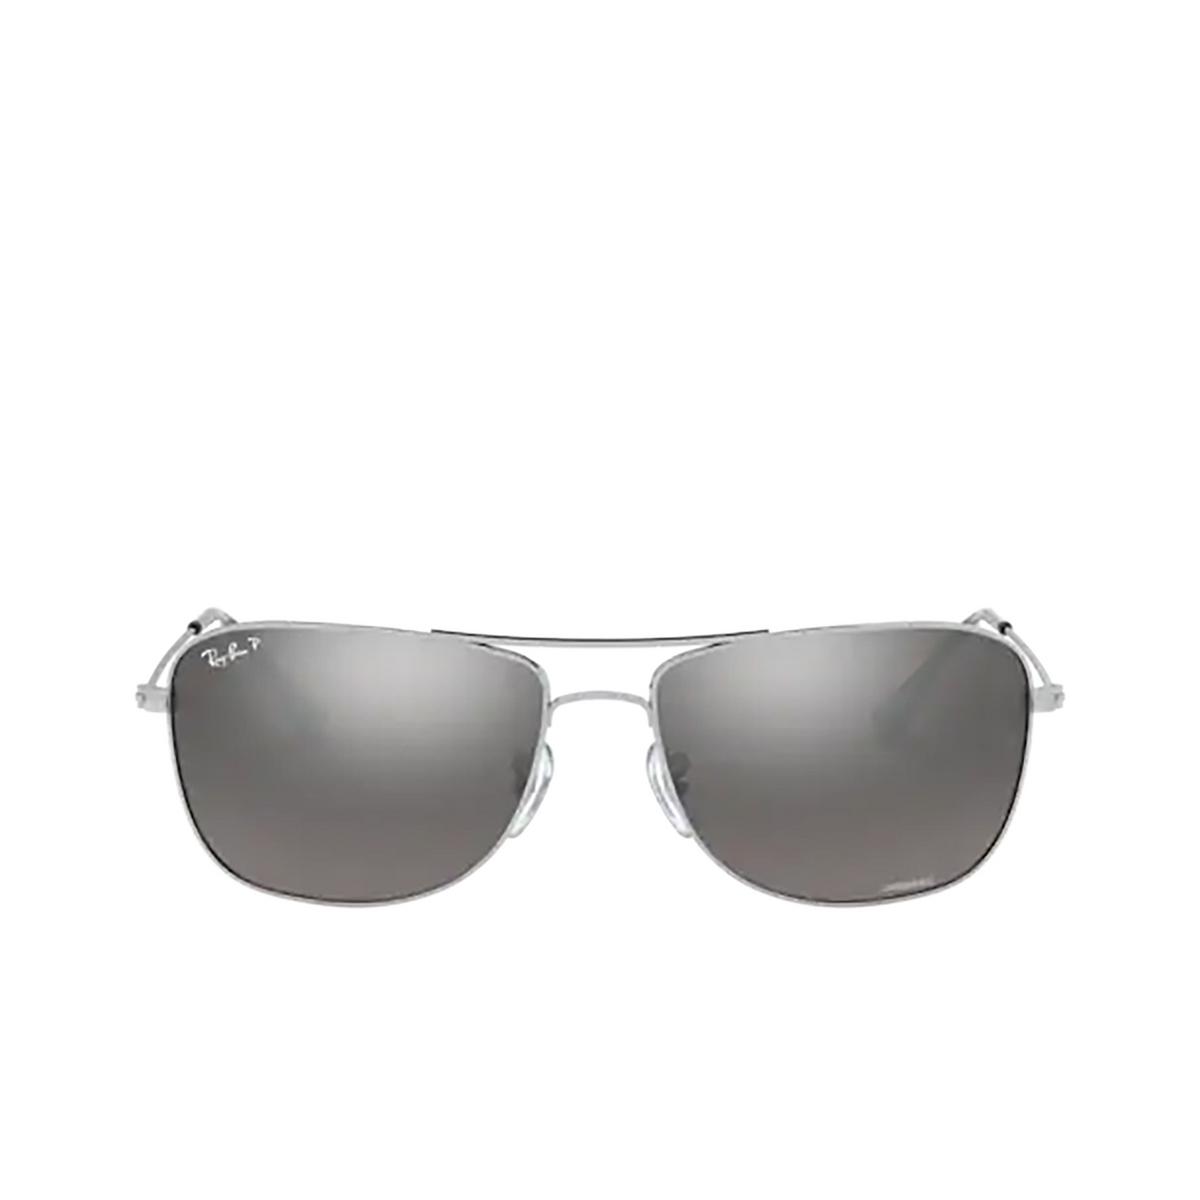 Ray-Ban® Aviator Sunglasses: RB3543 color Silver 003/5J - 1/3.